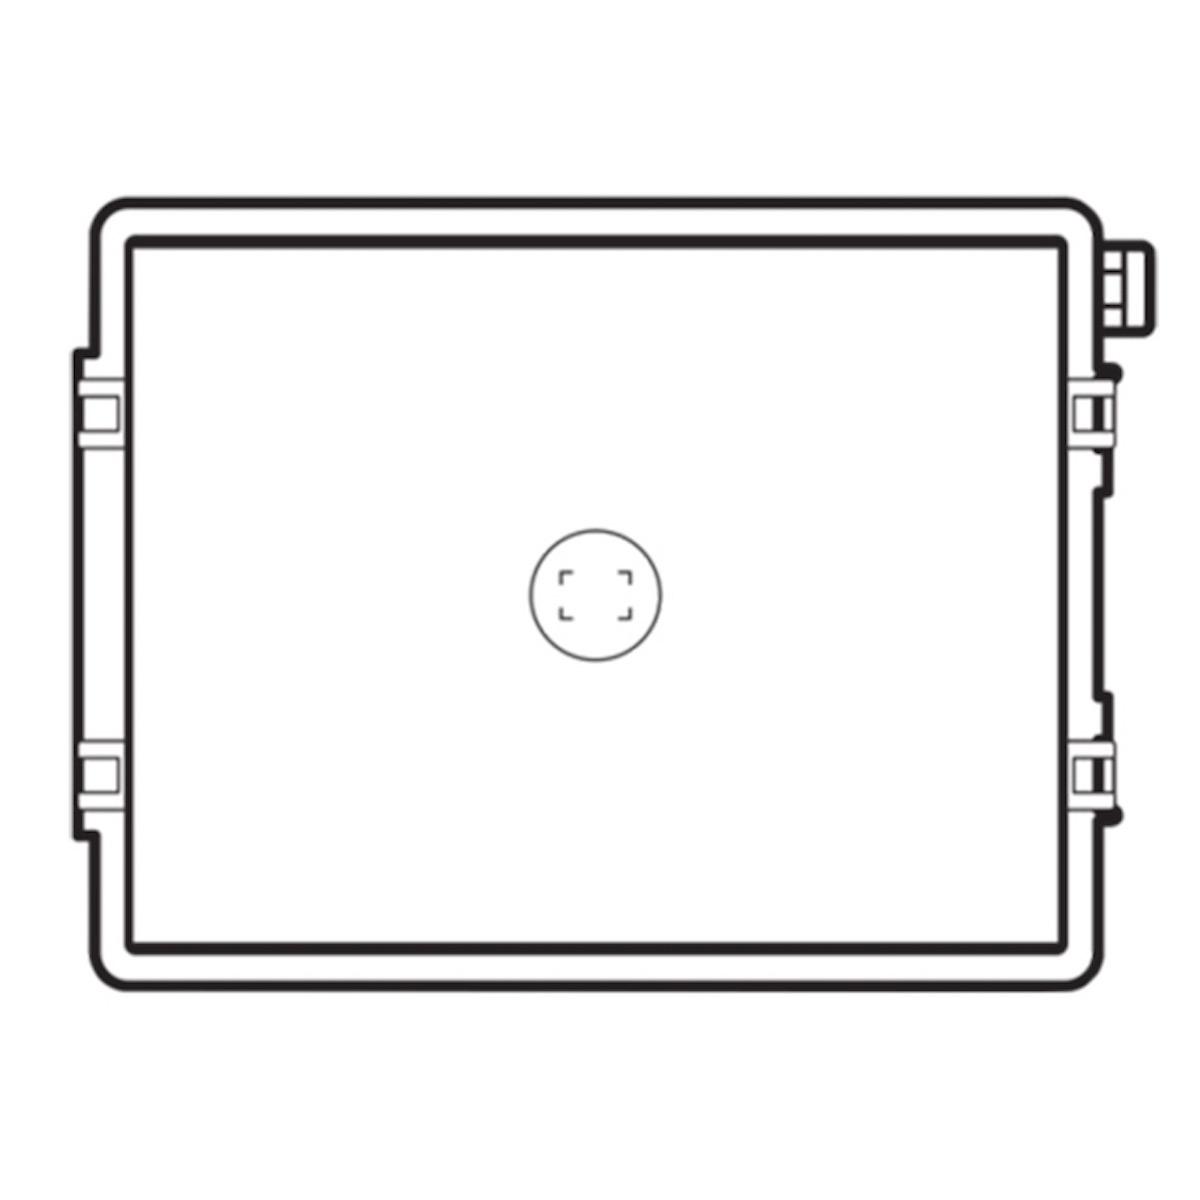 Hasselblad Fokussierscheibe 60MP CCD/100MP CMOS